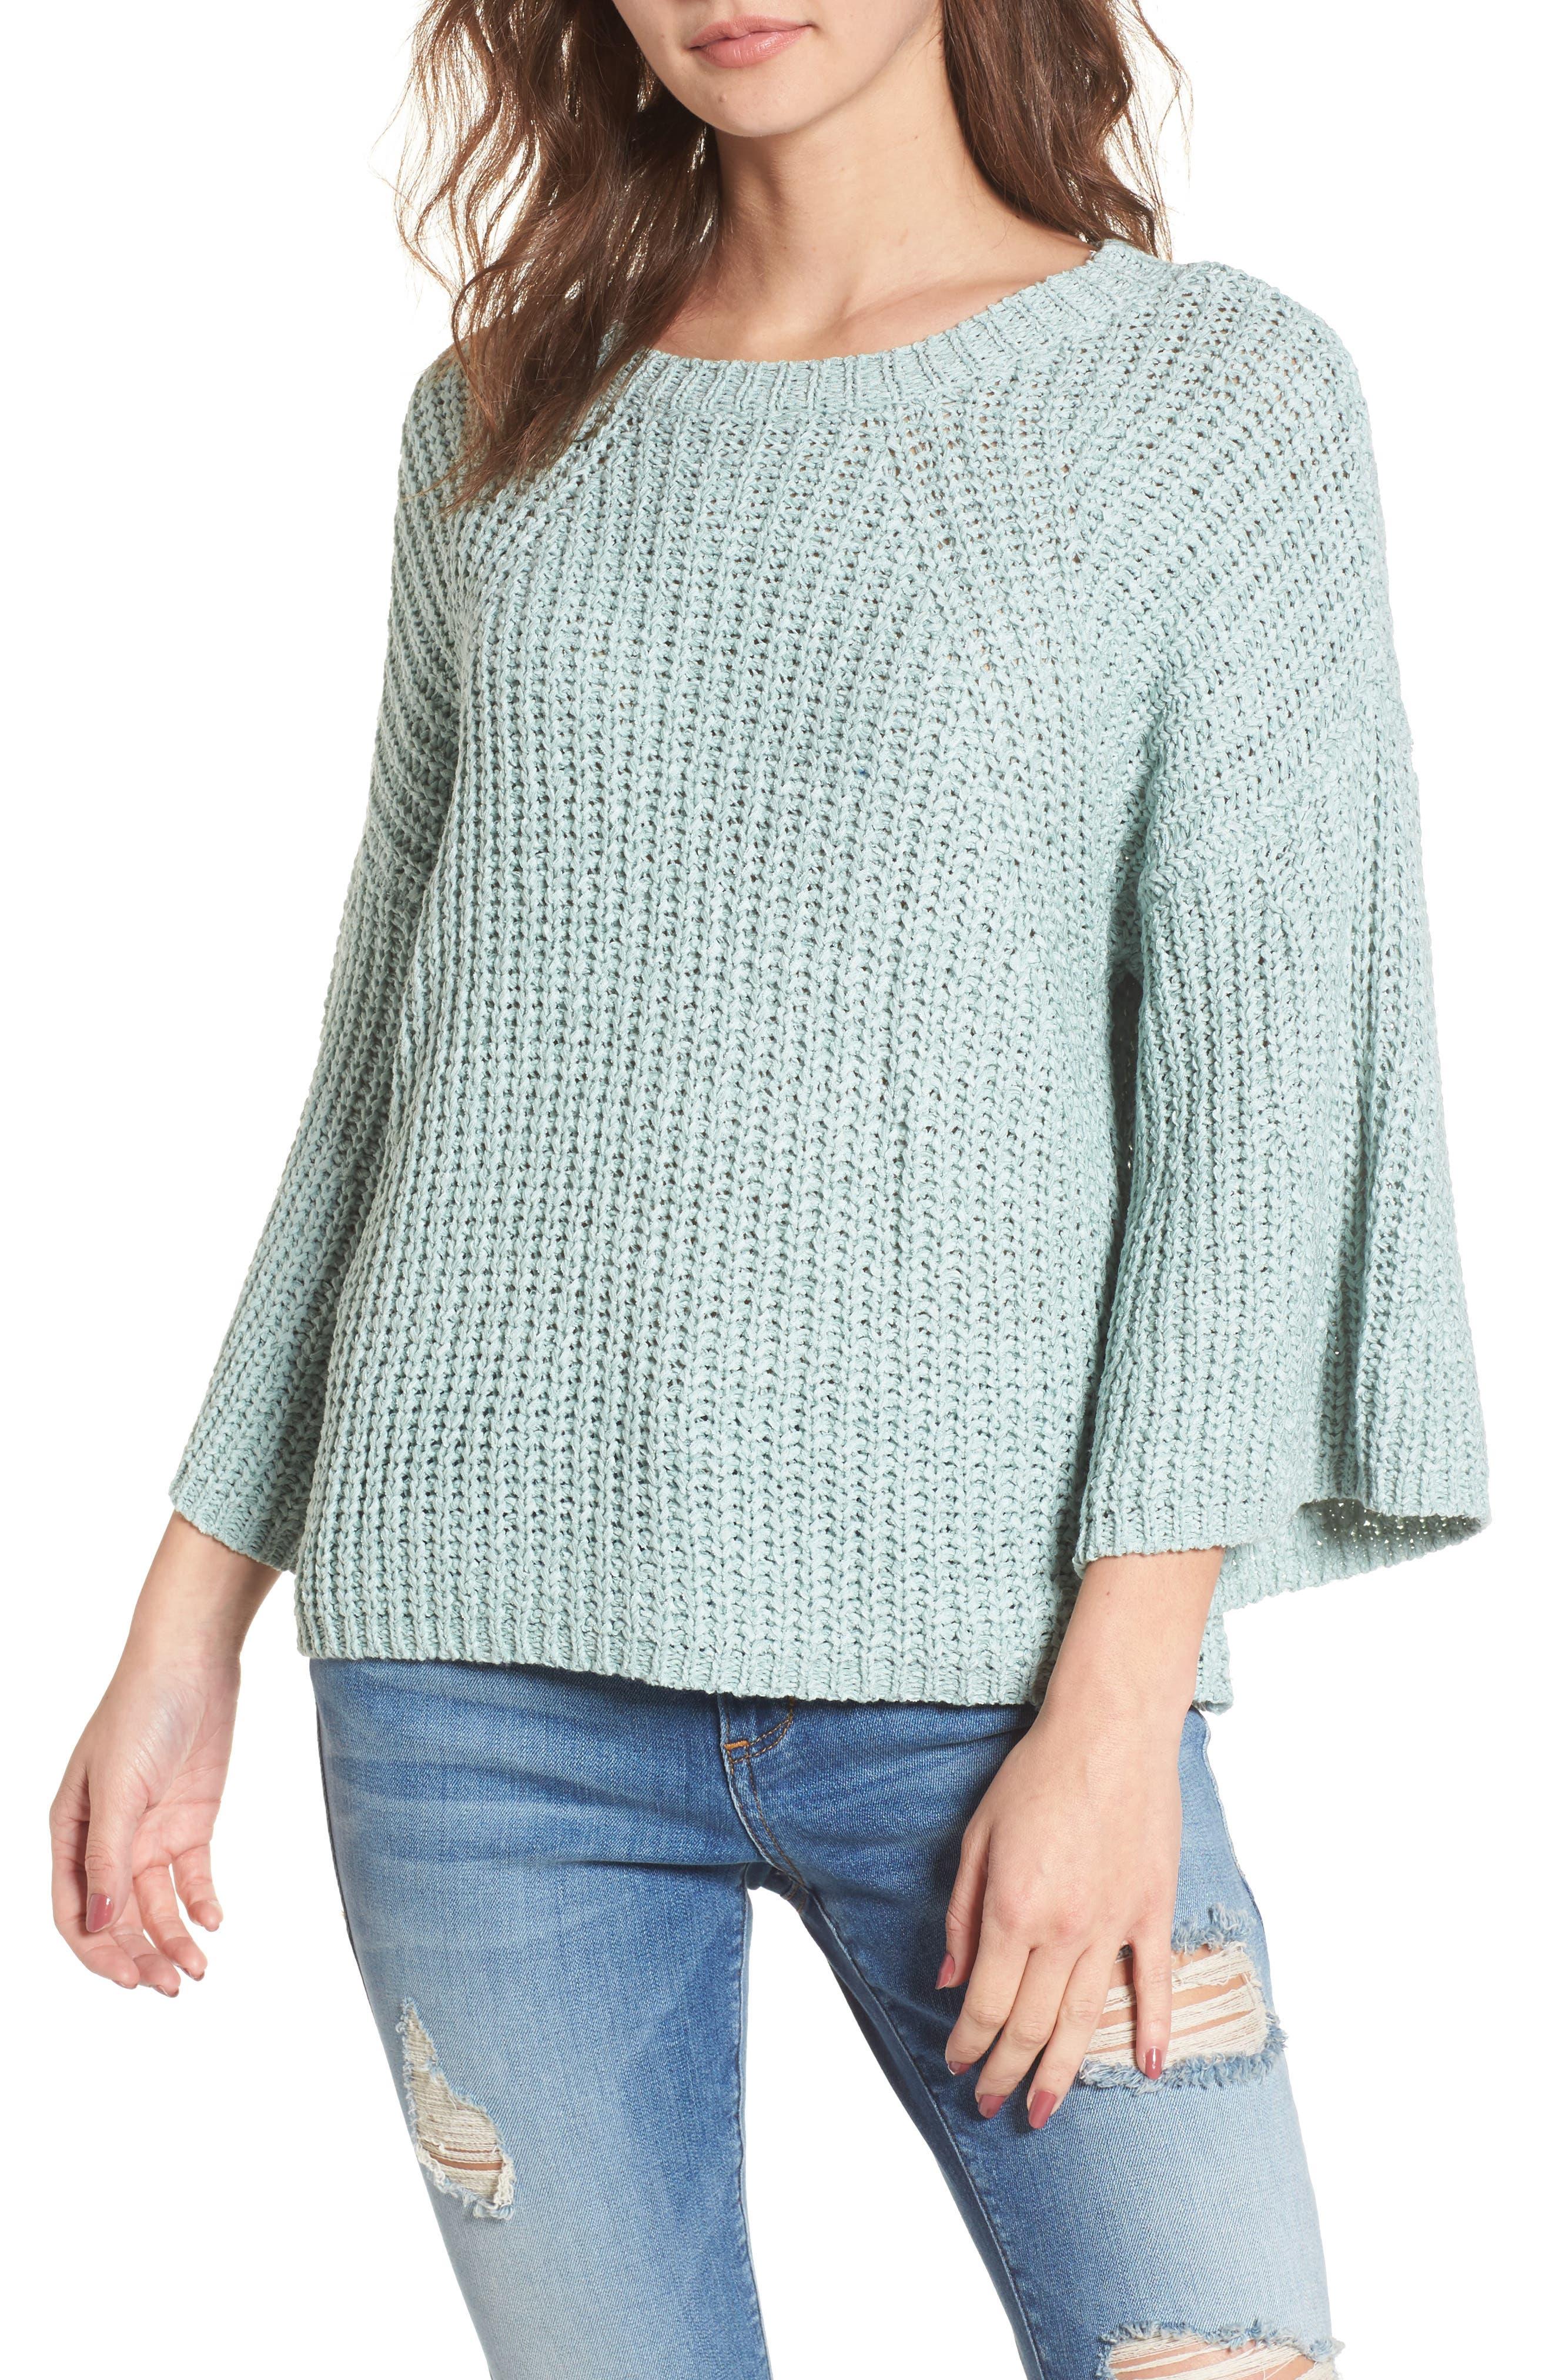 4SI3NNA Bell Sleeve Sweater